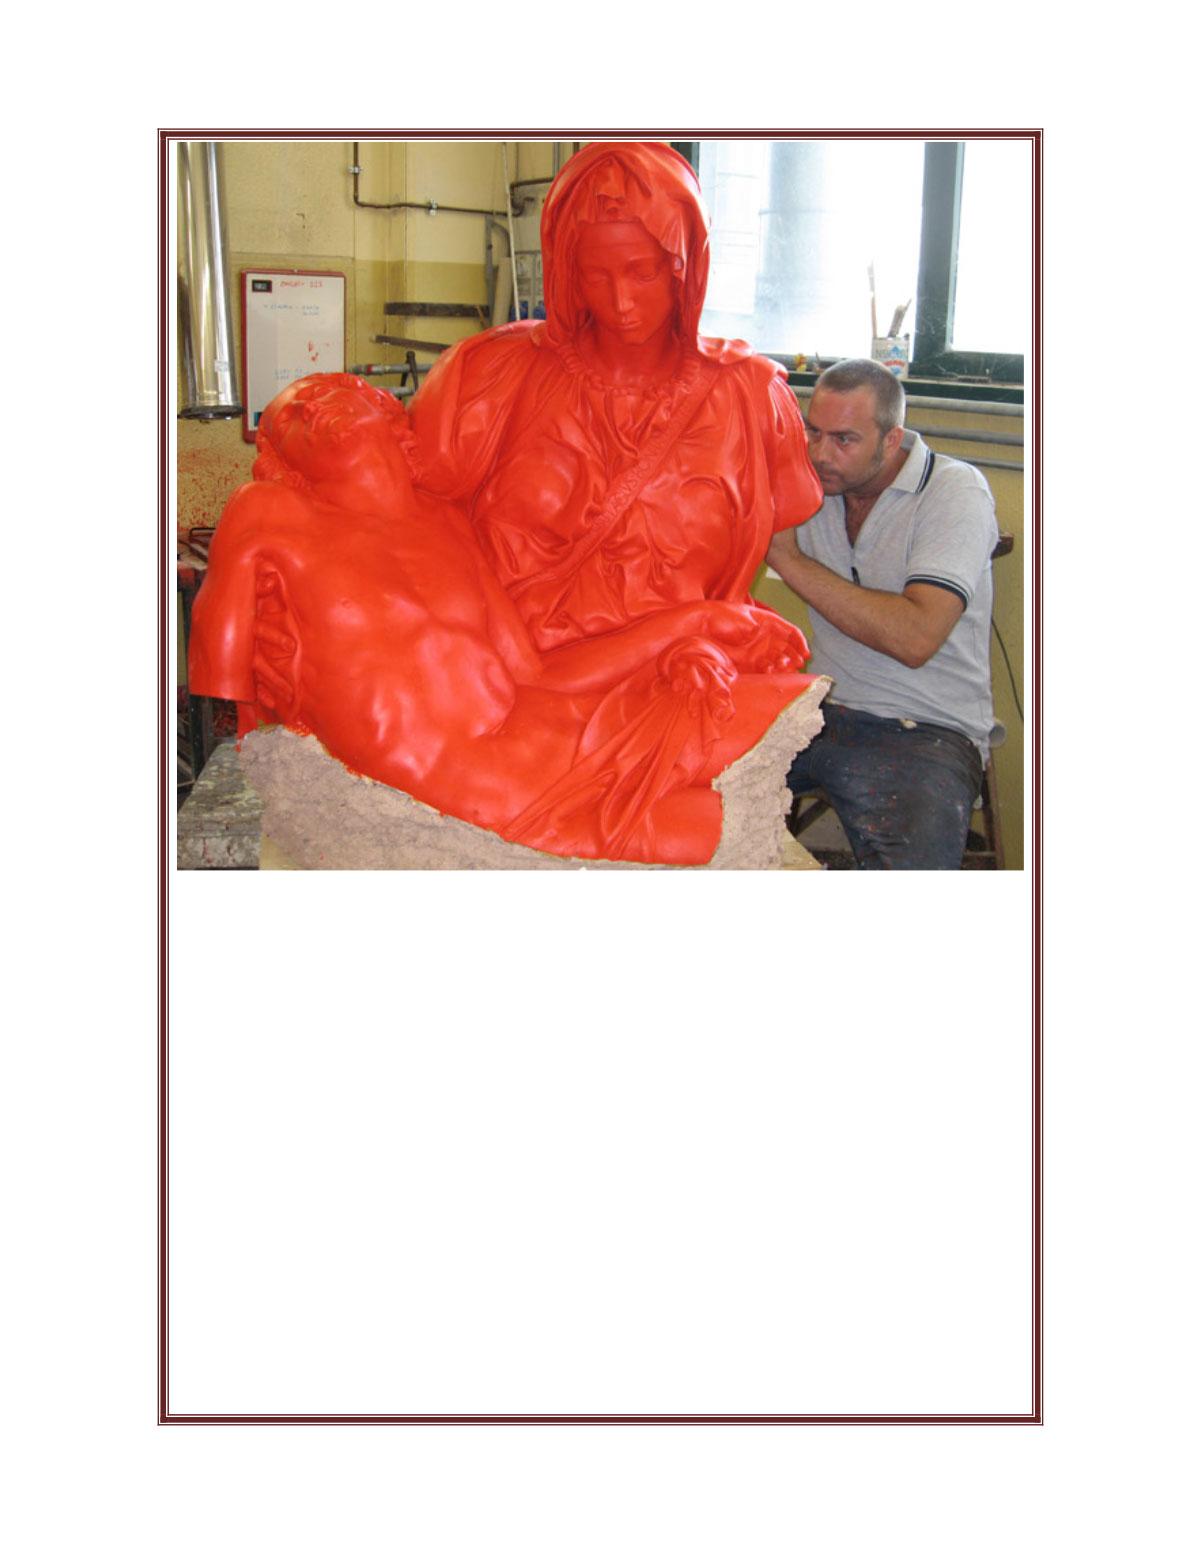 Bronzi per Michelangelo Florence, Italy Nov 10, 2010